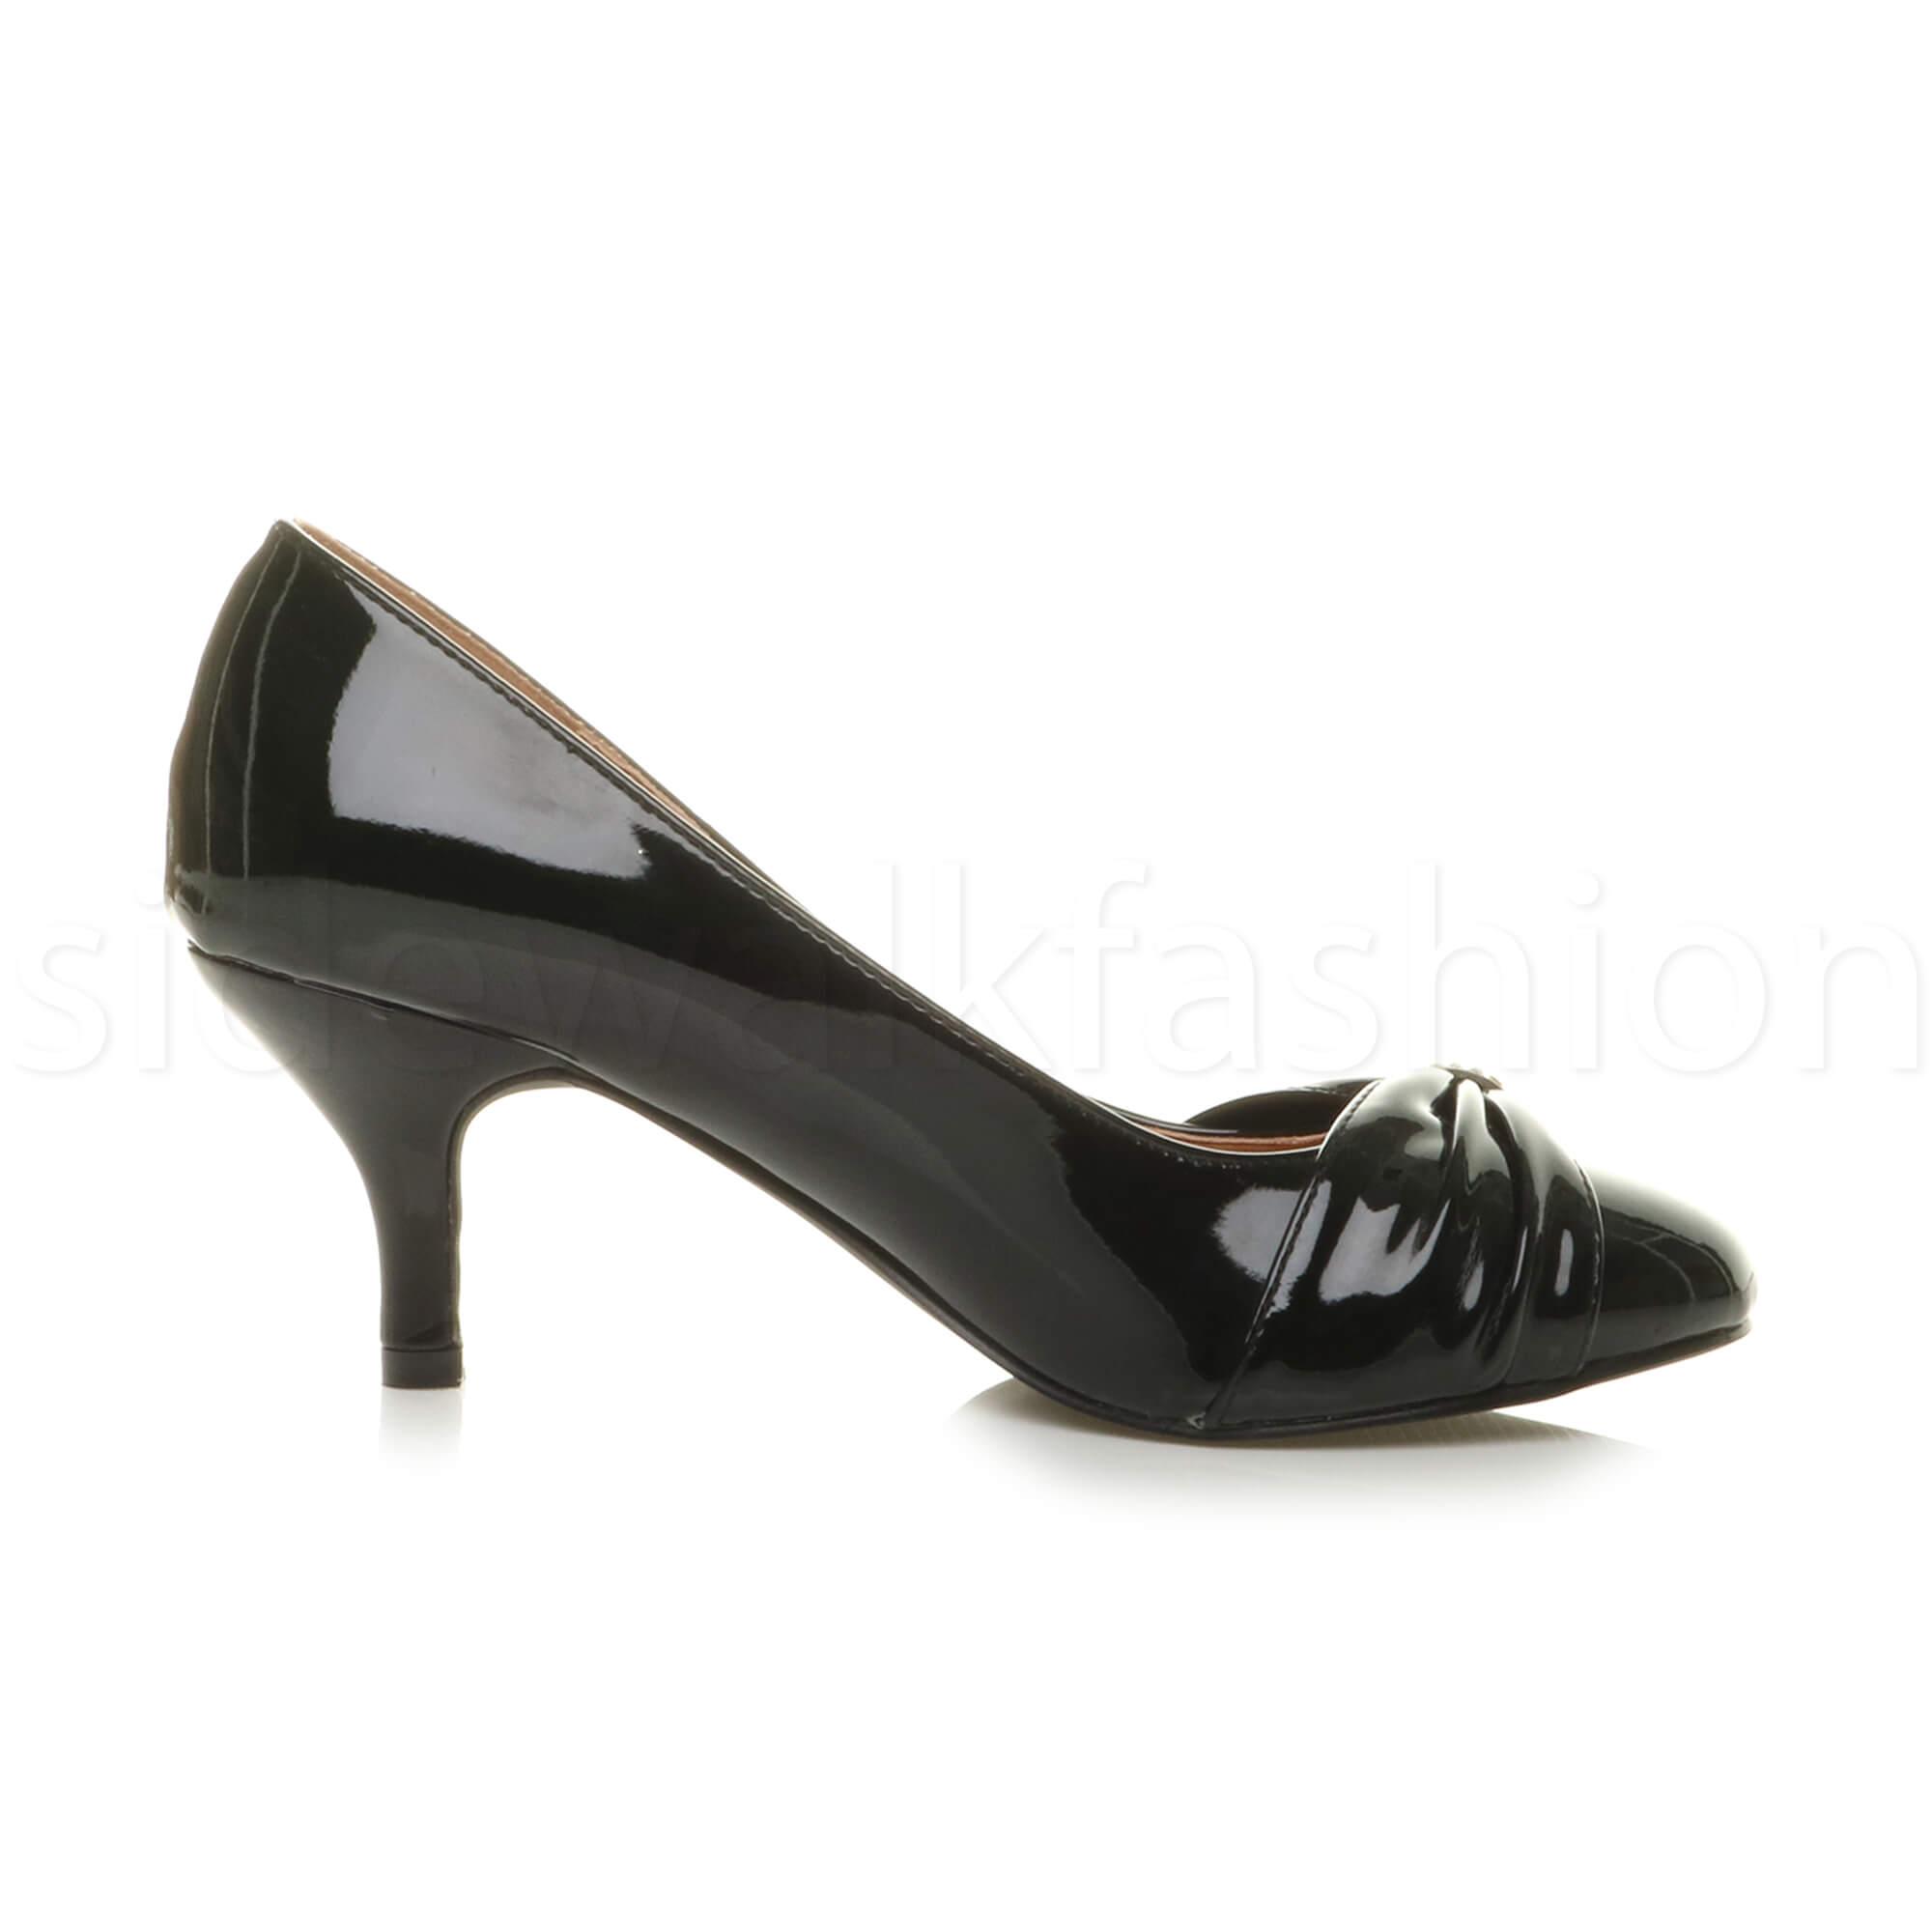 Womens-ladies-low-mid-heel-diamante-party-smart-evening-court-shoes-size thumbnail 12